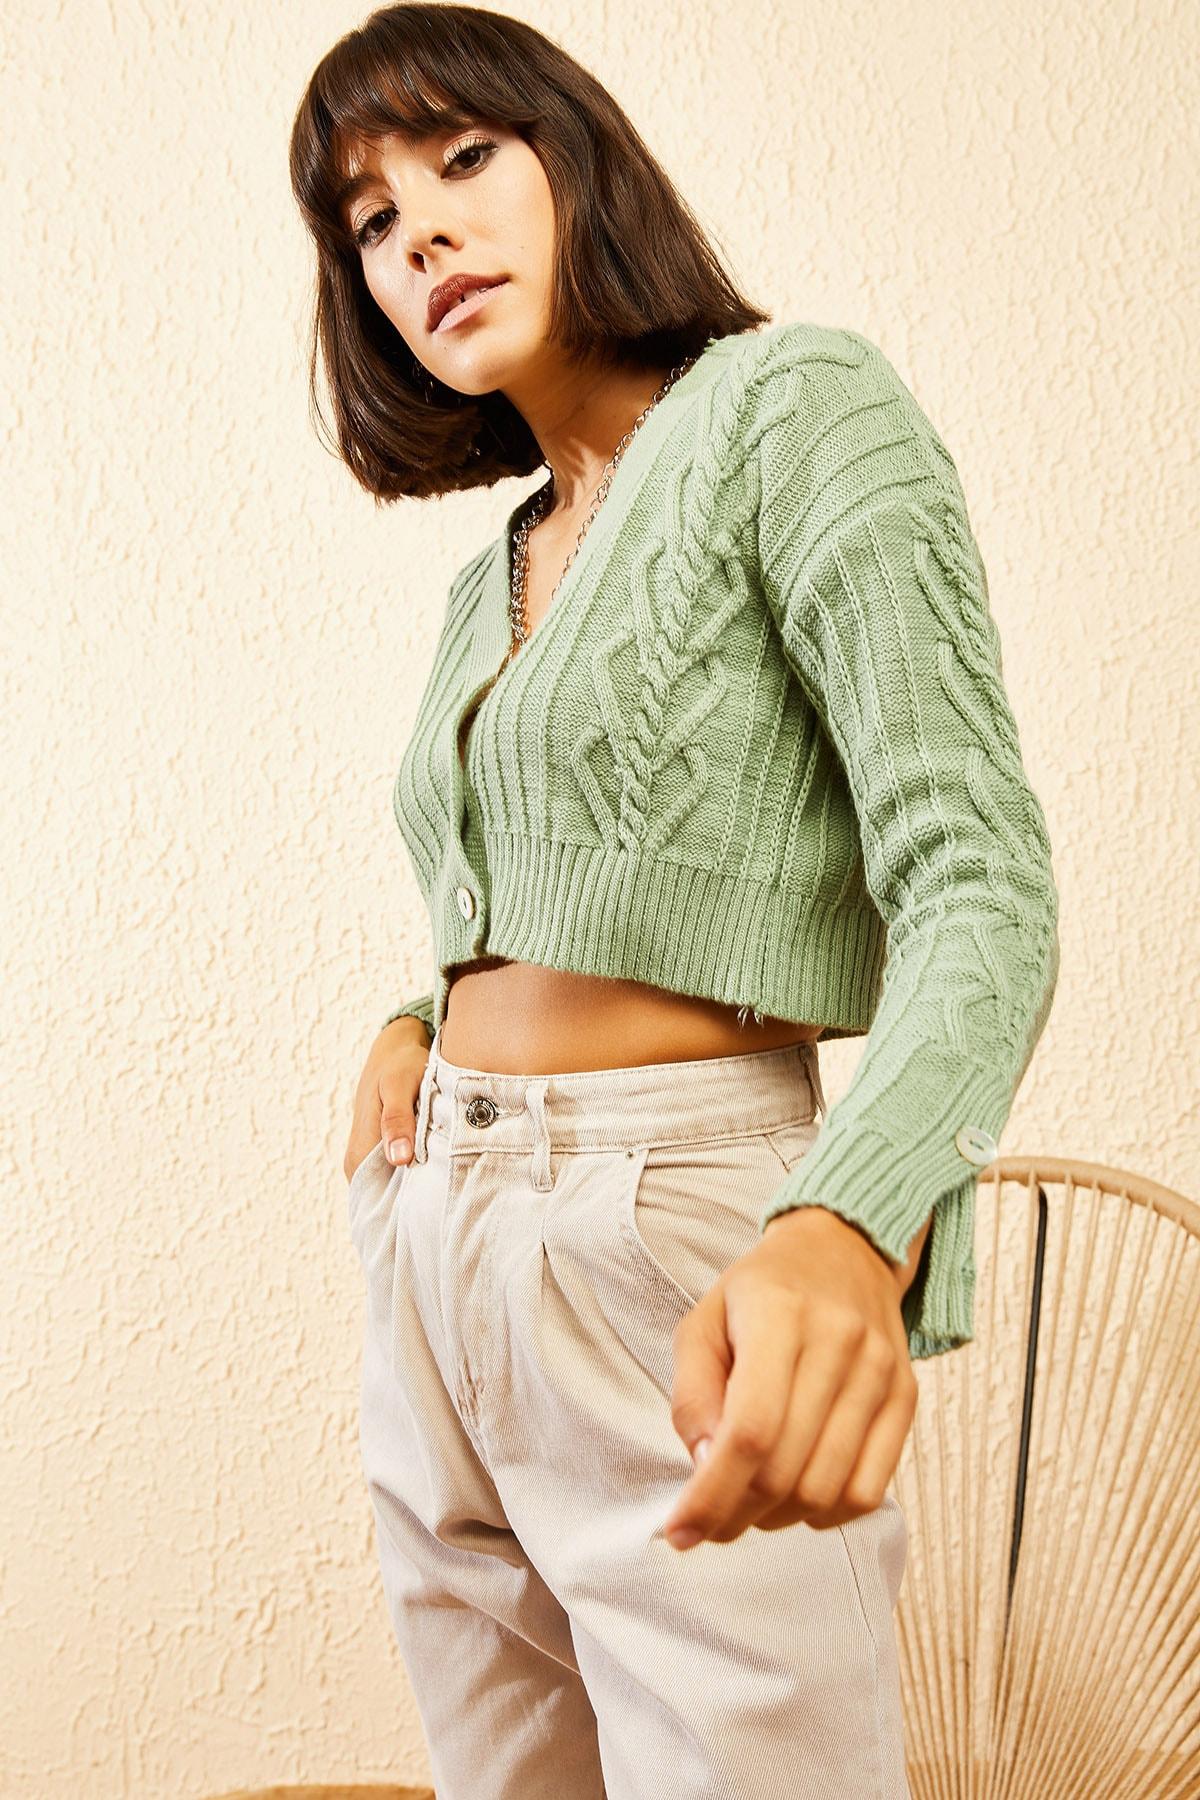 Bianco Lucci Kadın Çağla Yeşili Sac Detaylı Düğmeli Triko Hırka 10121082 2